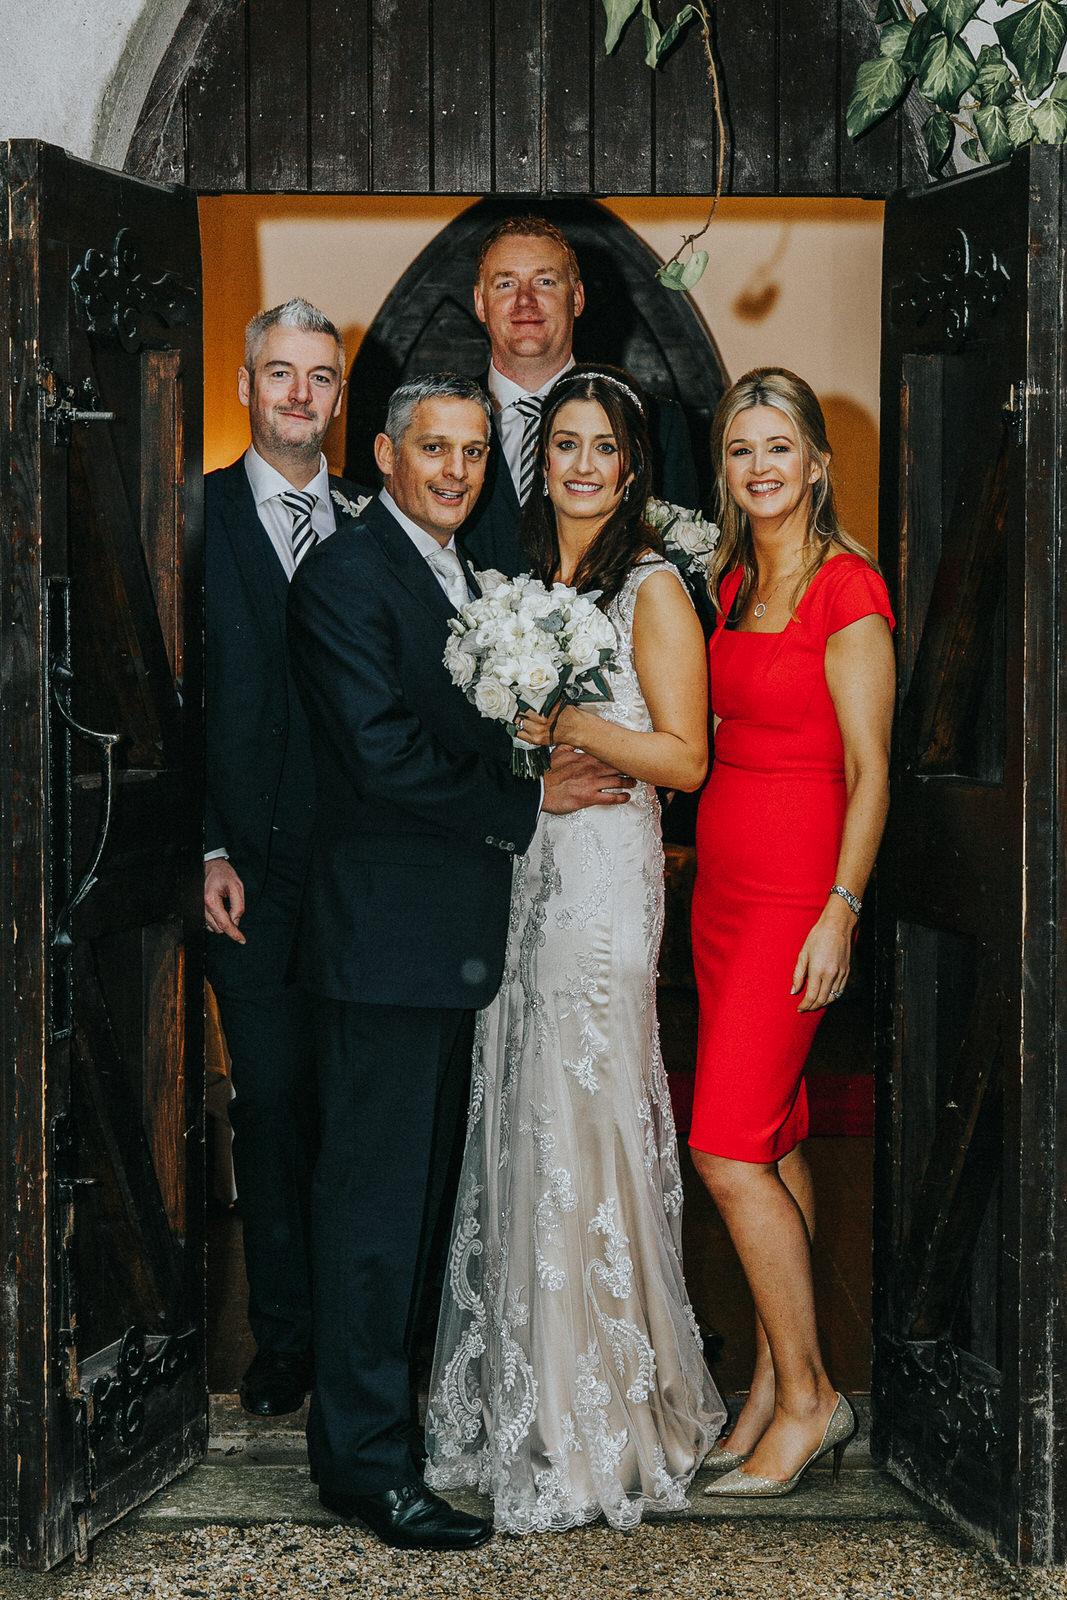 Roger_Kenny_wedding_photographer_Brooklodge__668.jpg